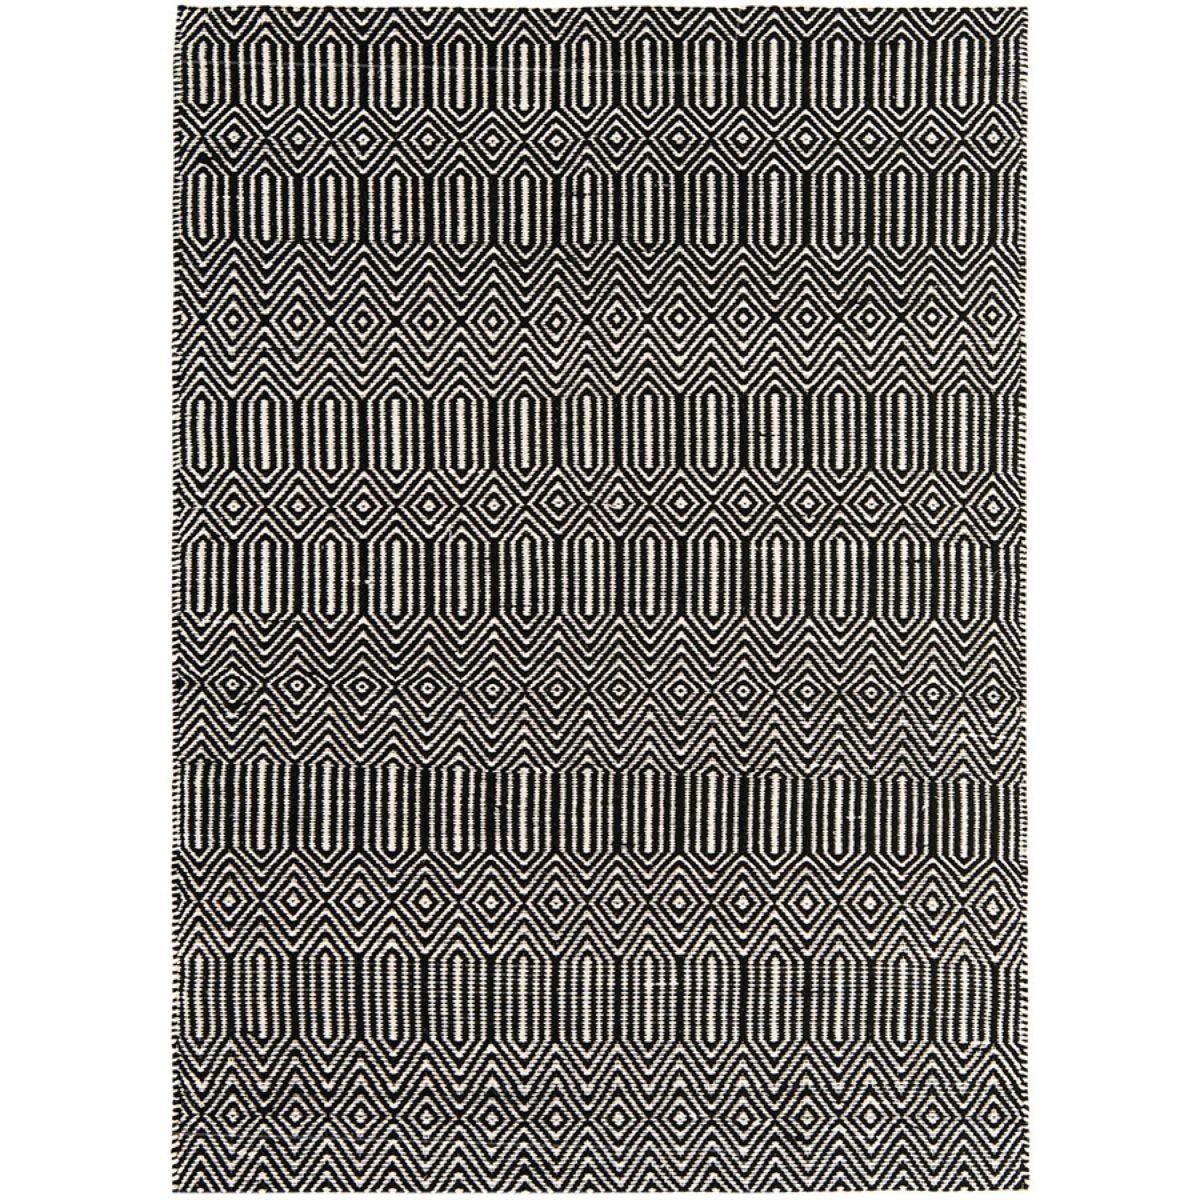 Asiatic Sloan Rug, 100 x 150cm - Black